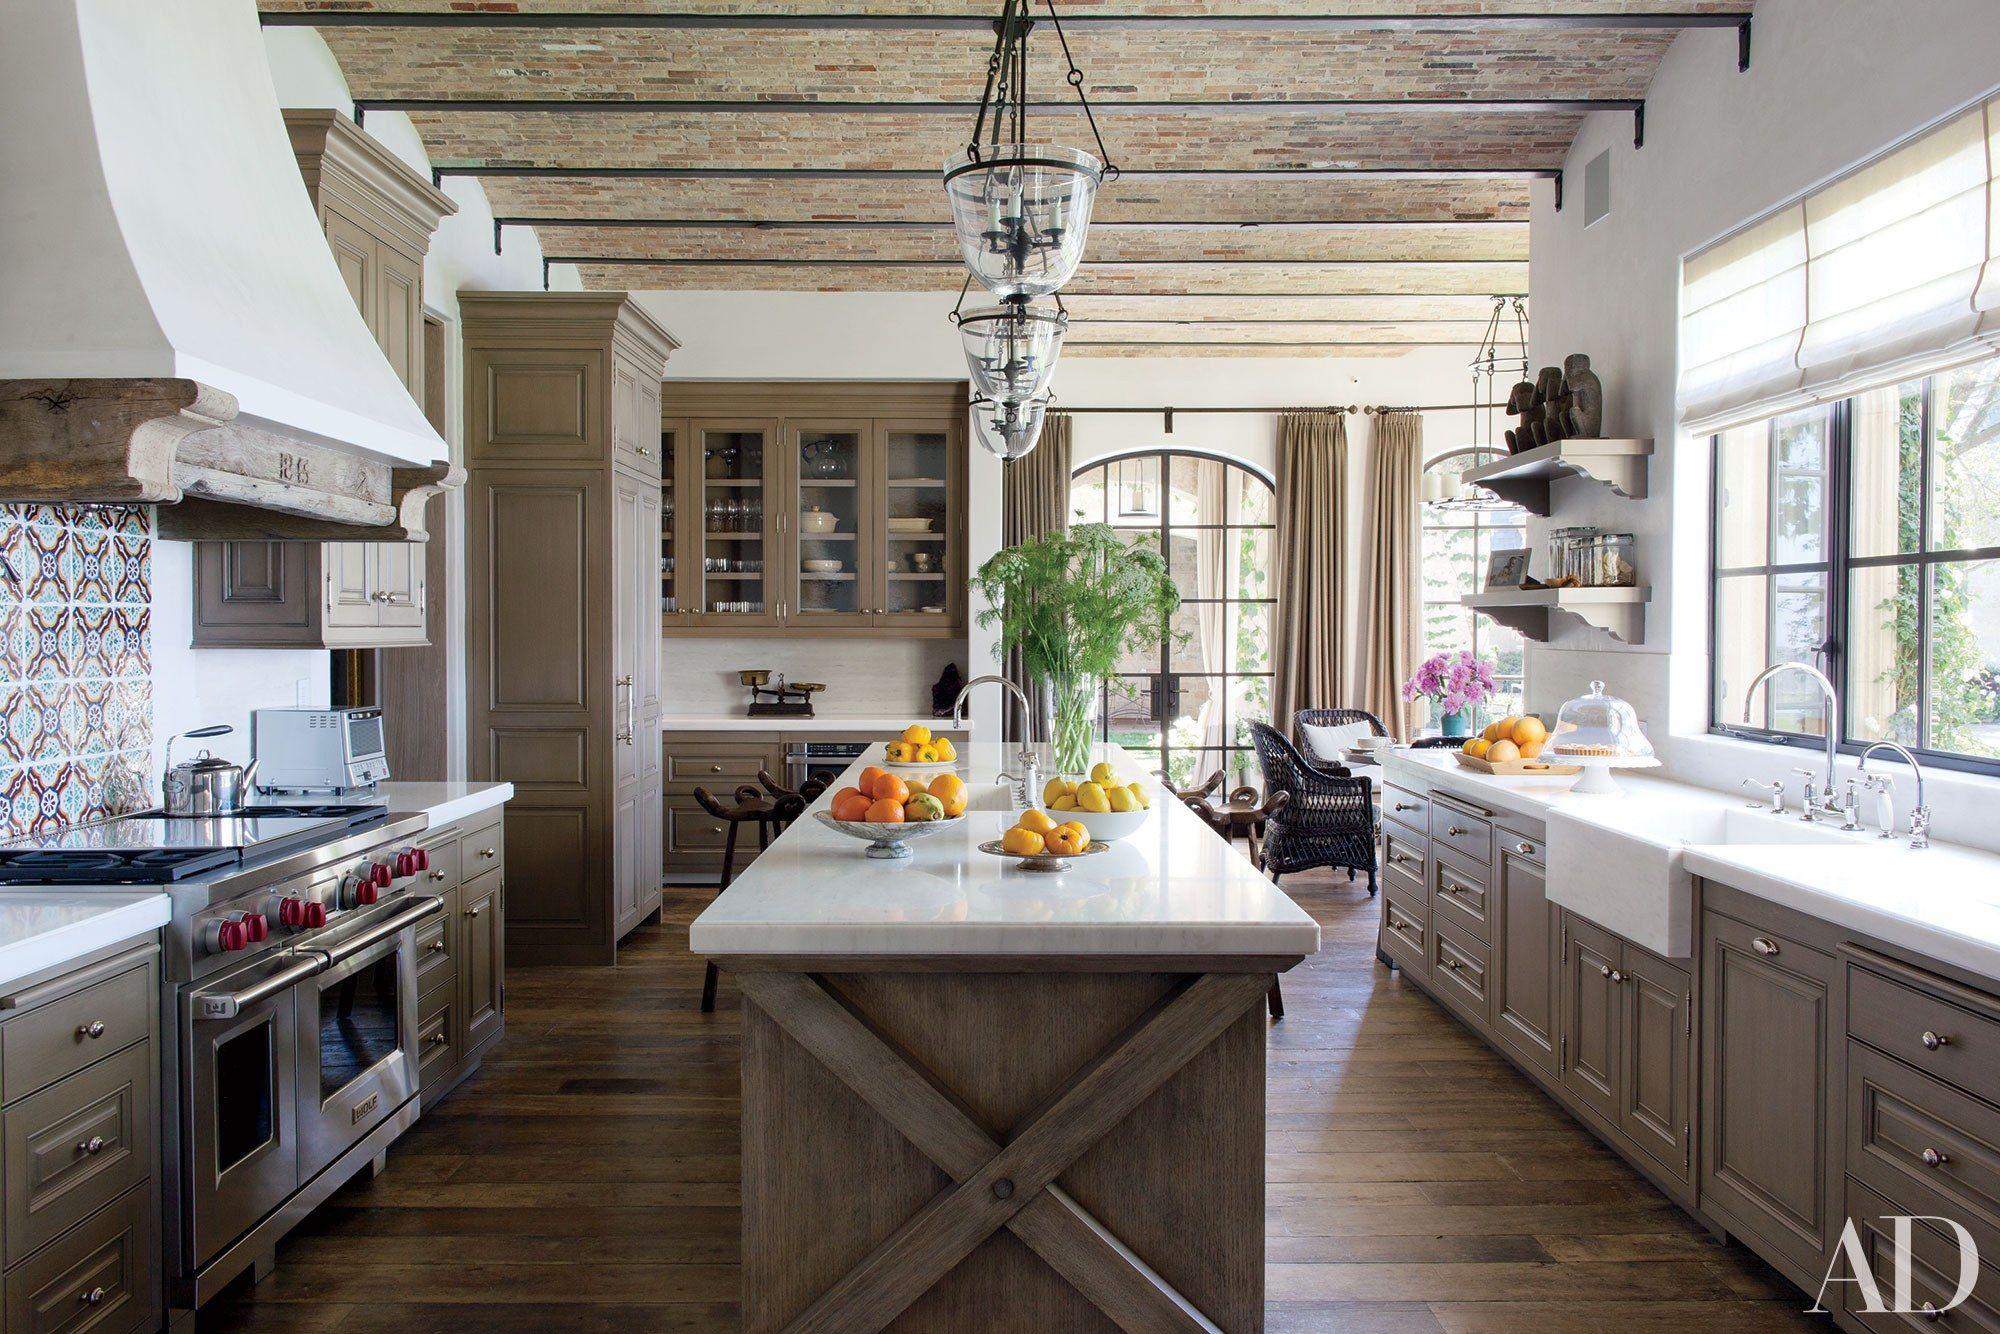 ordinary modern farmhouse kitchen Part - 3: ordinary modern farmhouse kitchen nice look